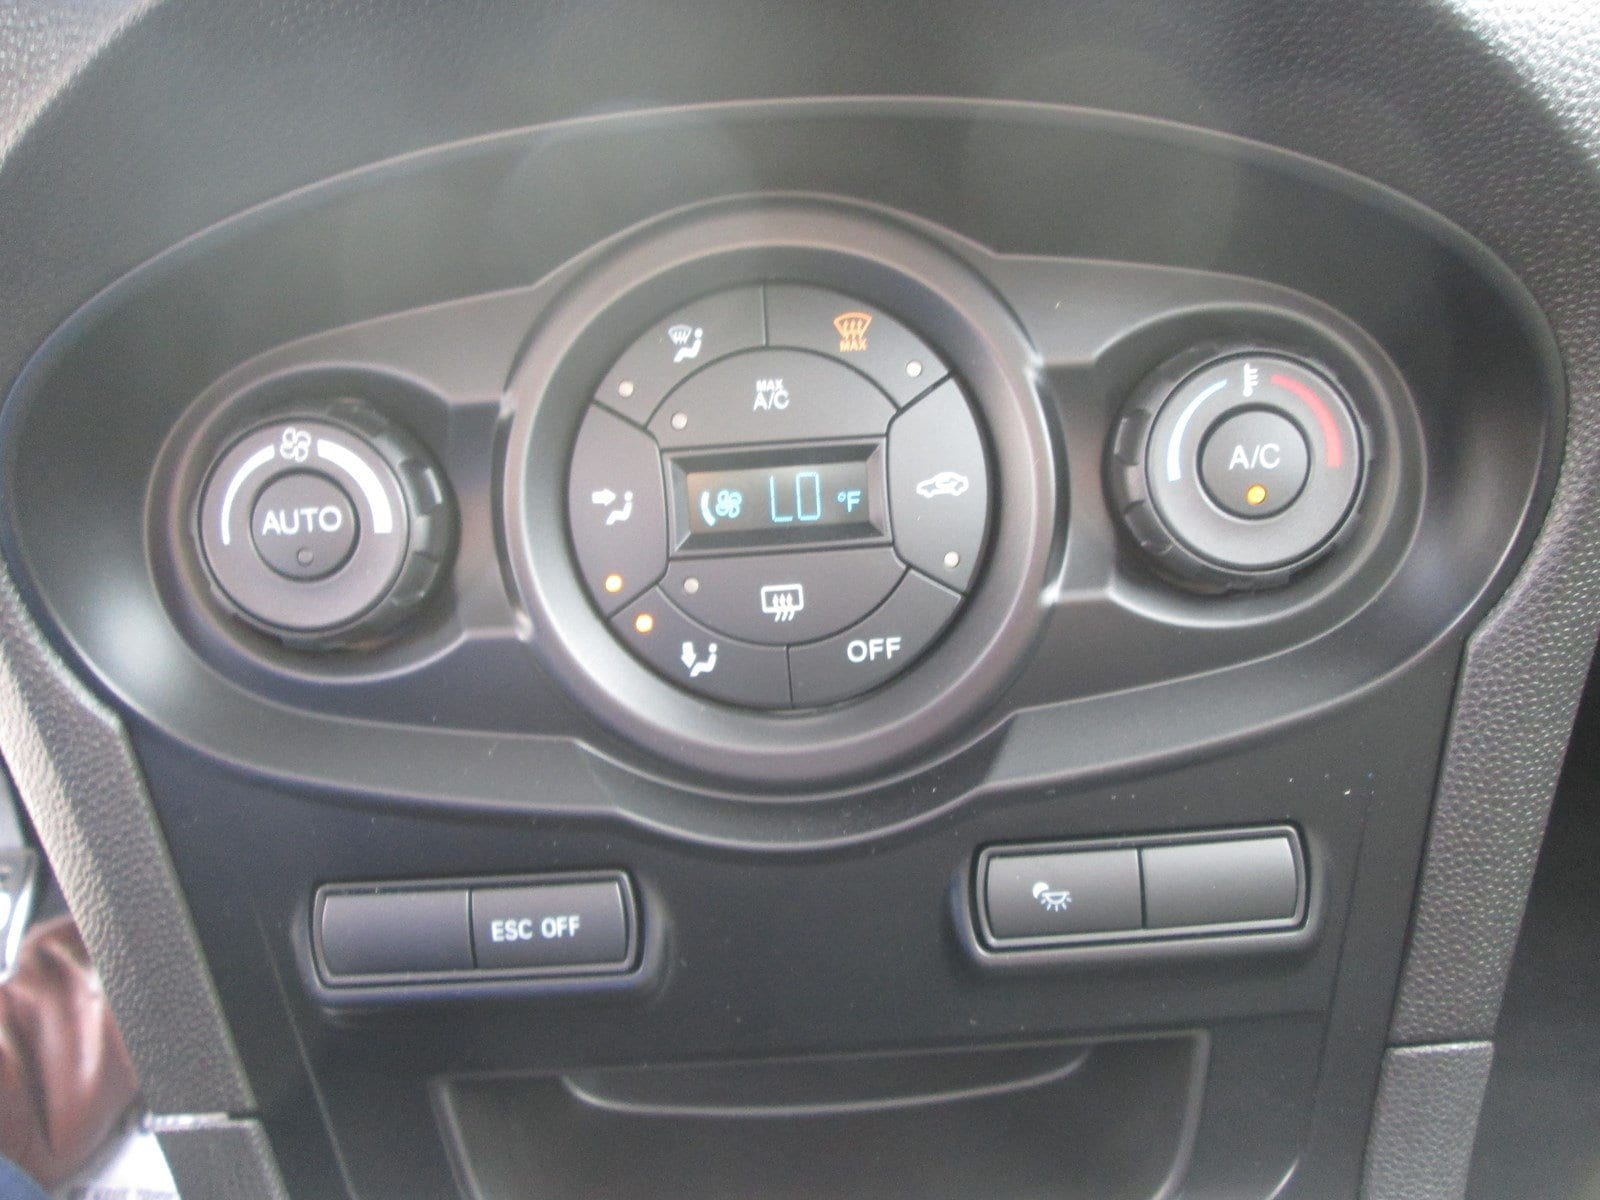 Home Dealer Installed Mazda Keyless Entry Remote 4b Remote Start Goh